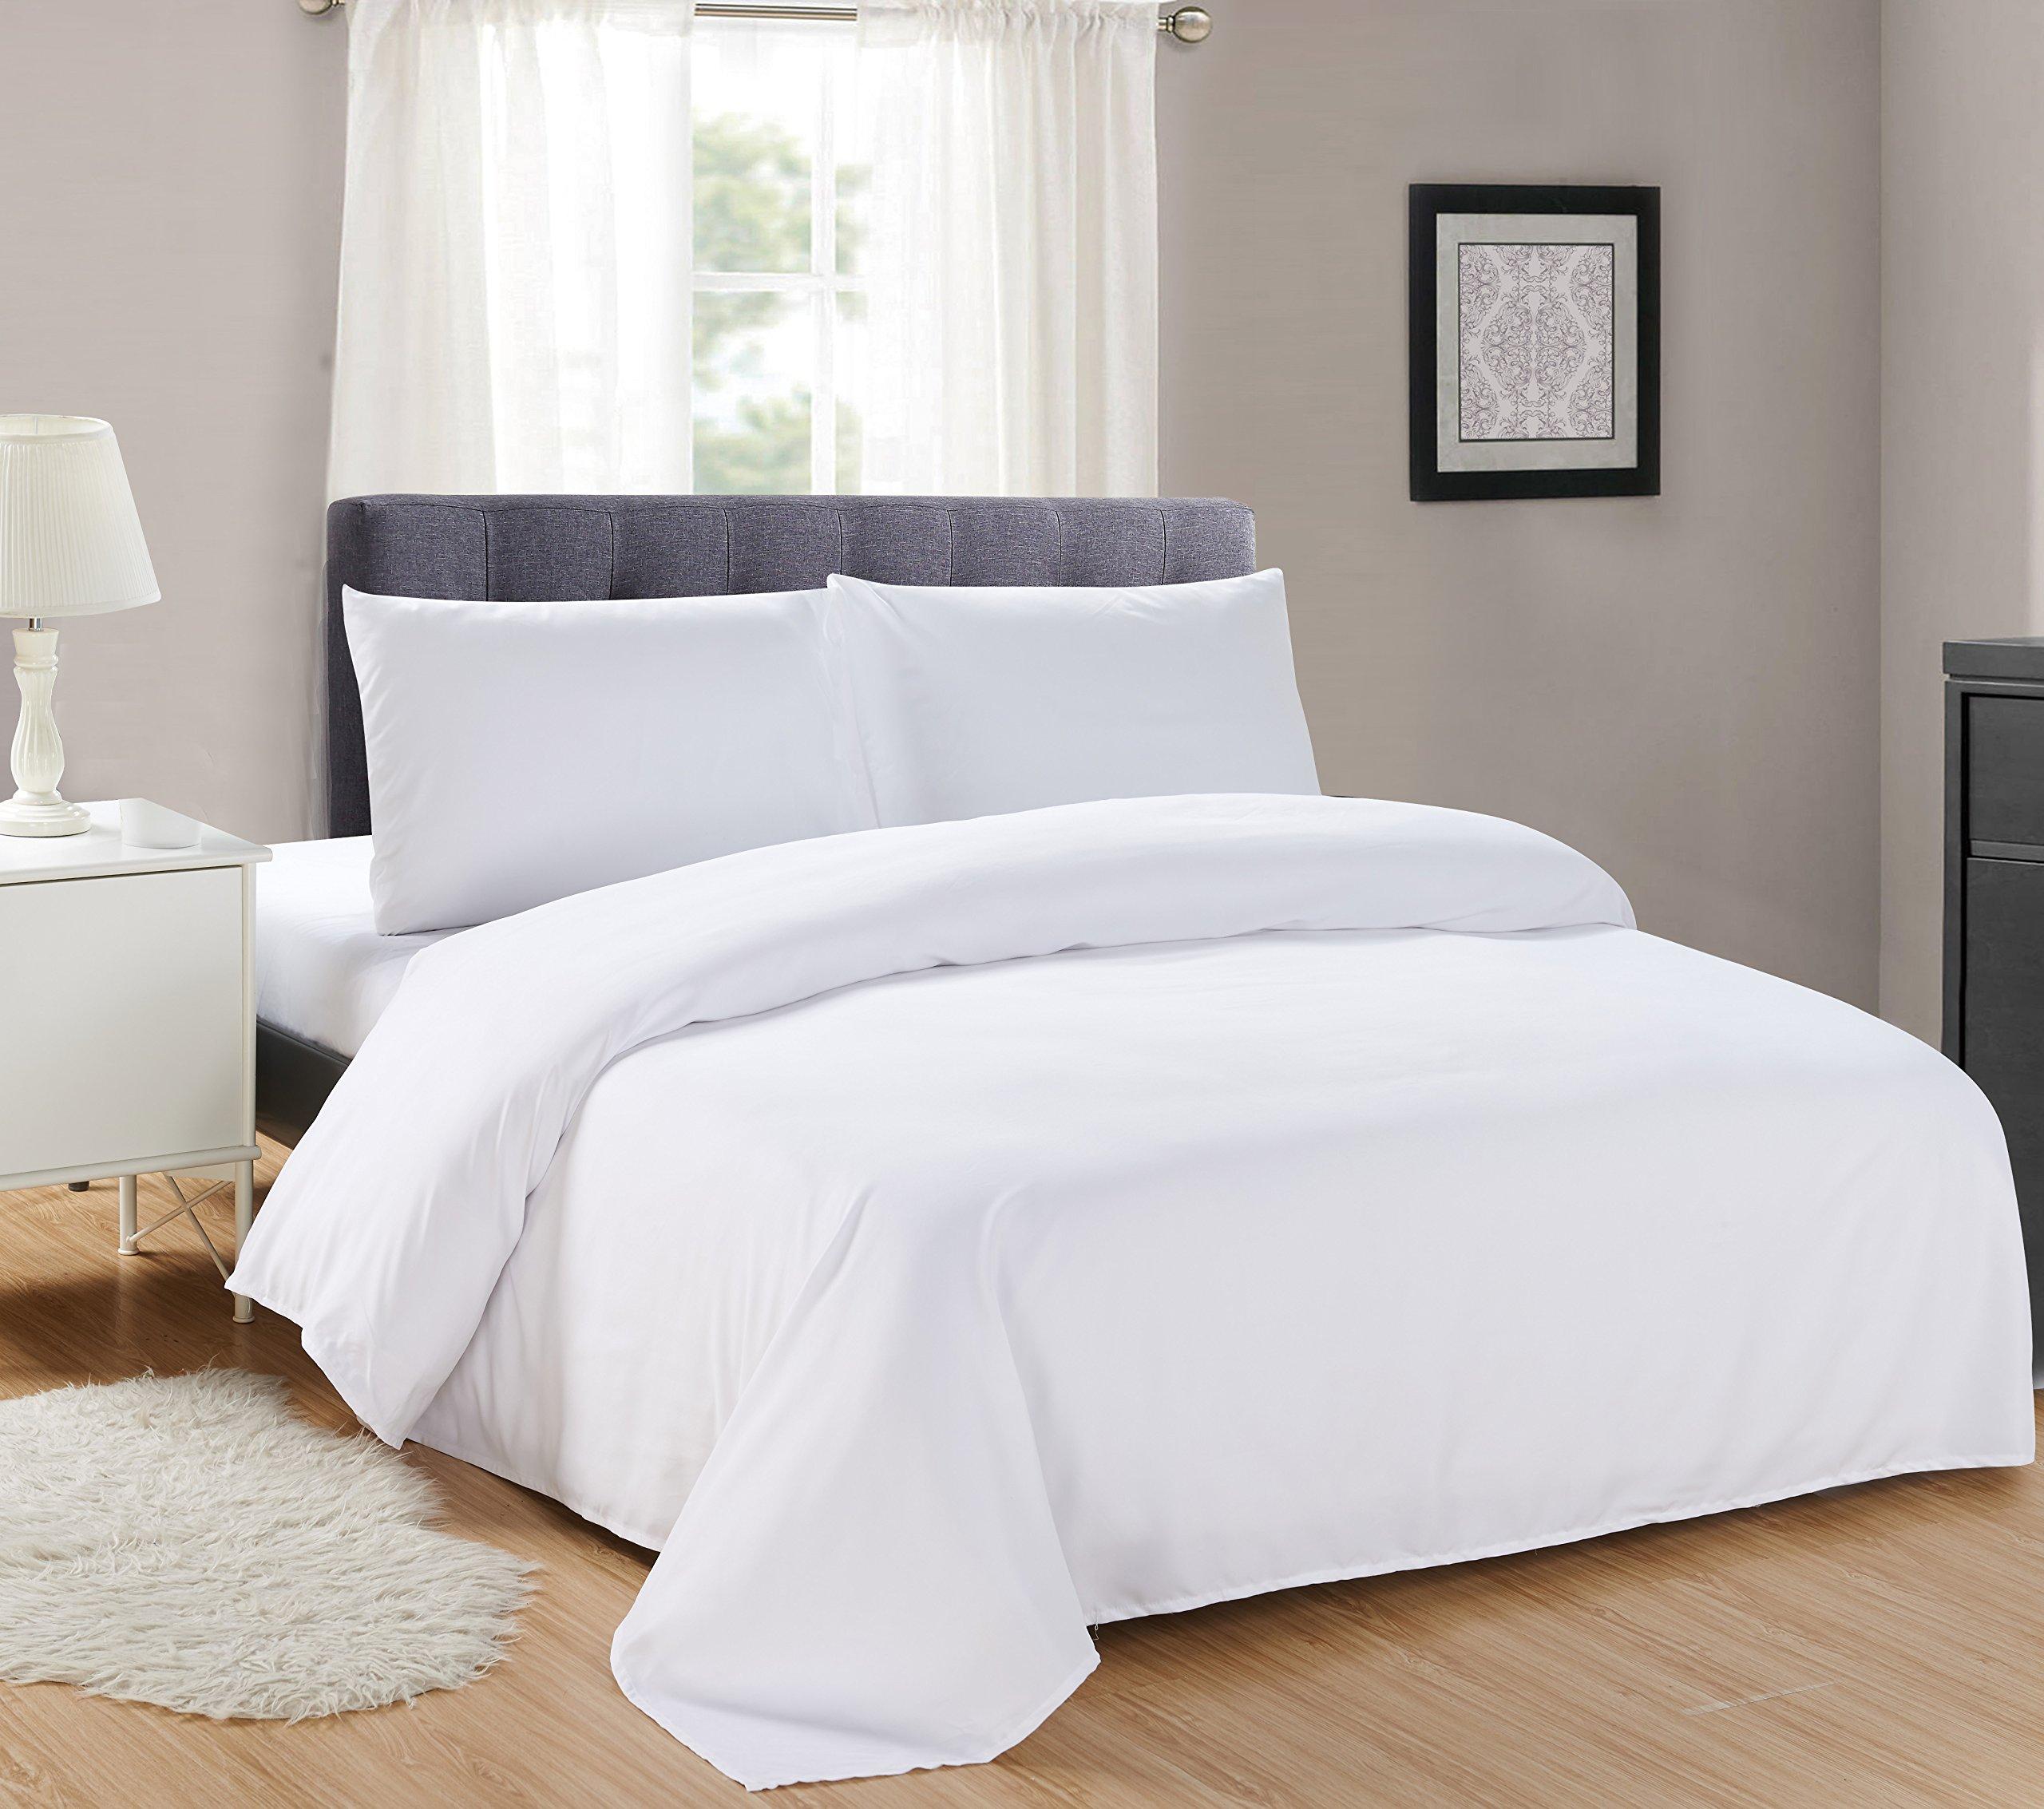 Sonia Moer Microfibre Pillowcase Set